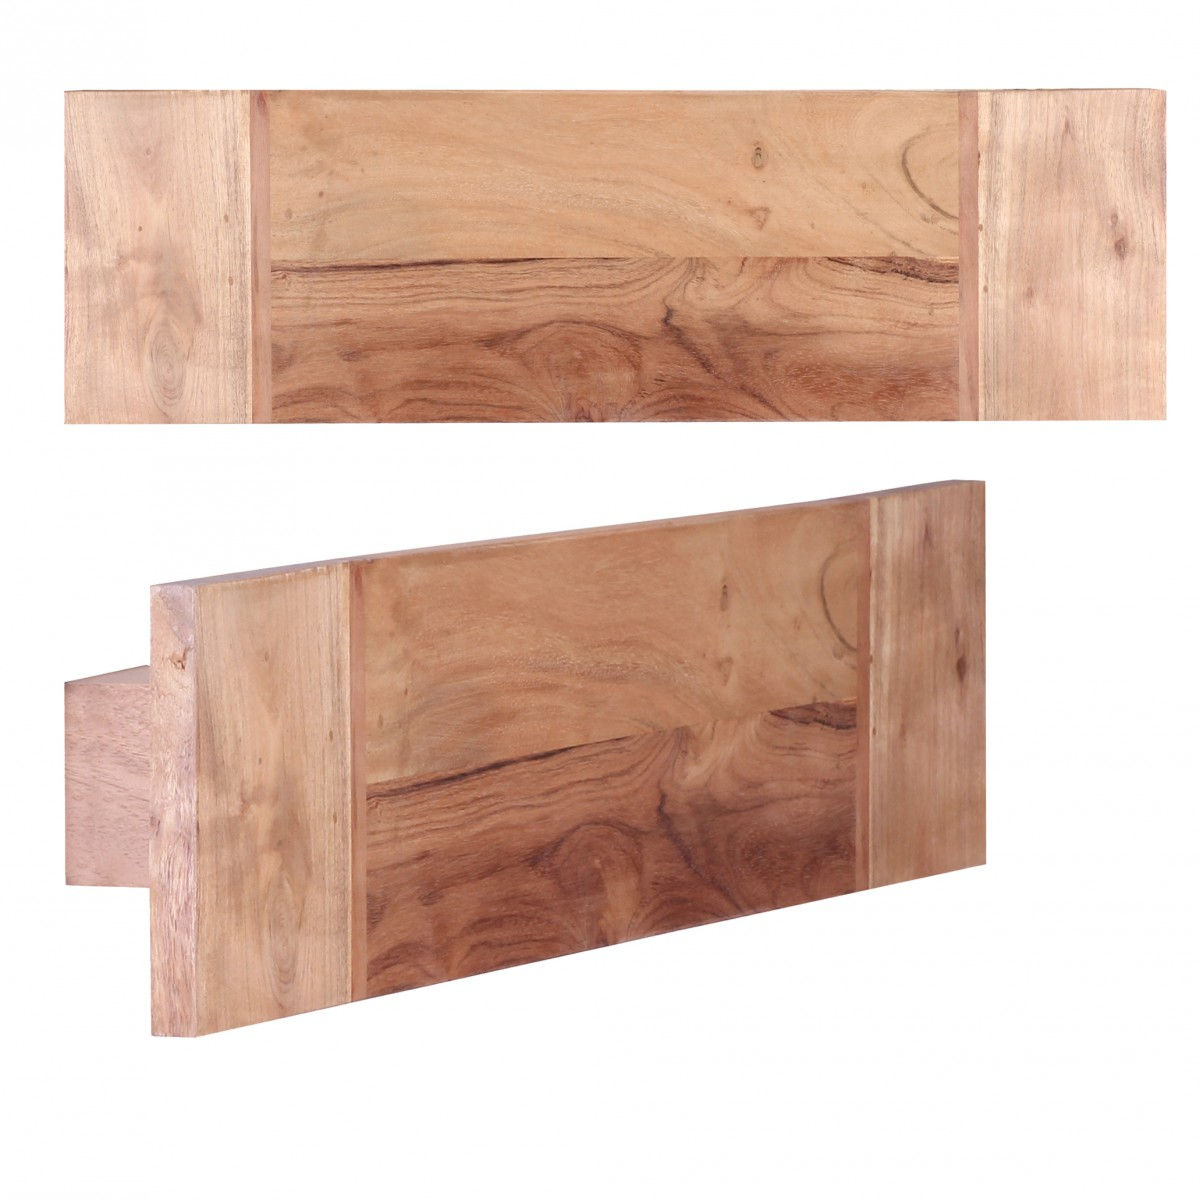 decopoint m bel in troisdorf weran handtuchhalter mumbai massivholz akazie 50 cm wandregal. Black Bedroom Furniture Sets. Home Design Ideas